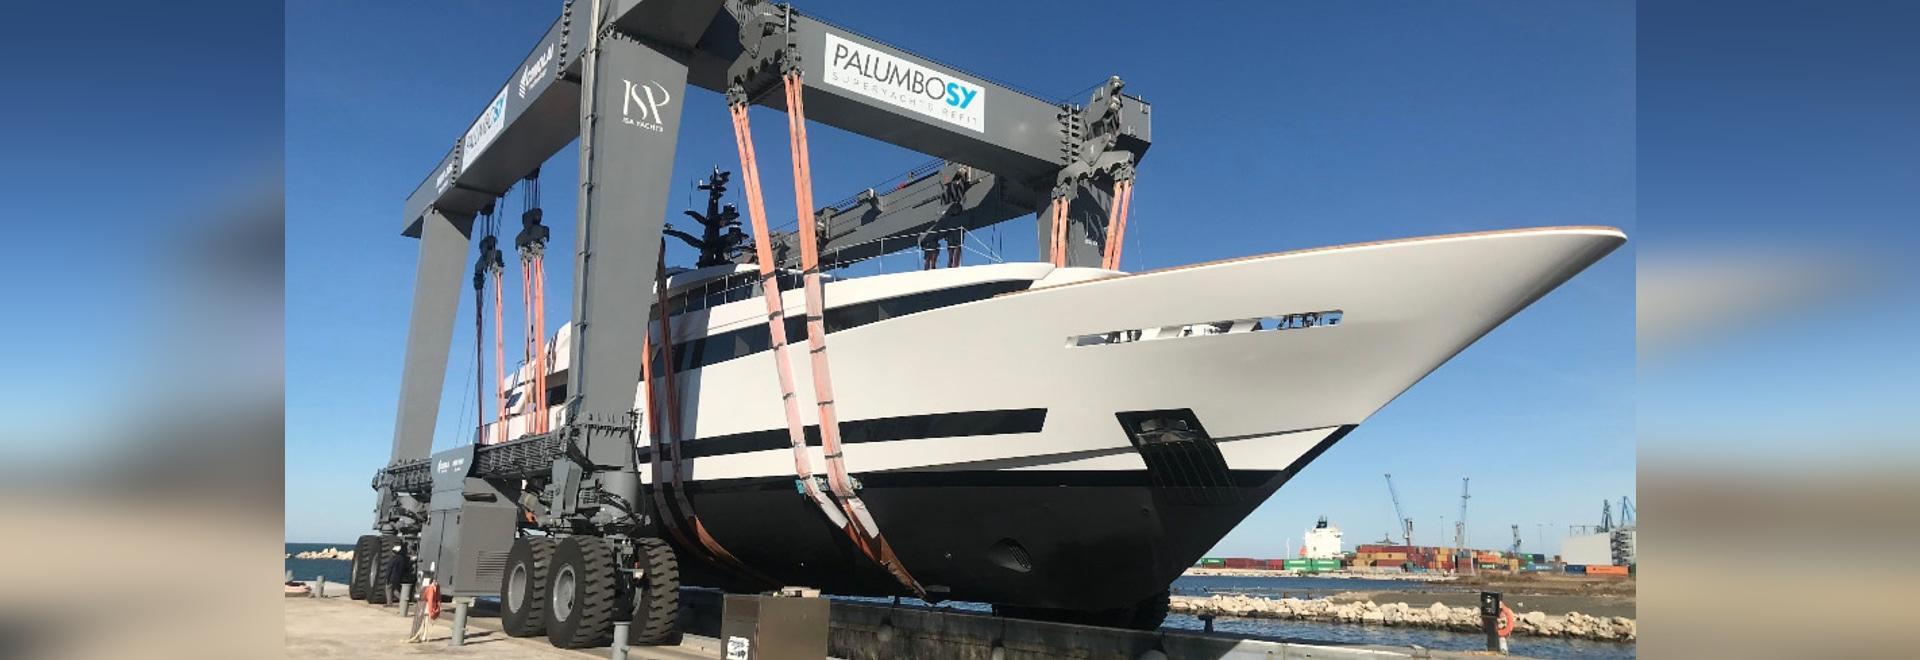 ISA startet zweites superyacht unter Palumbo-Besitz